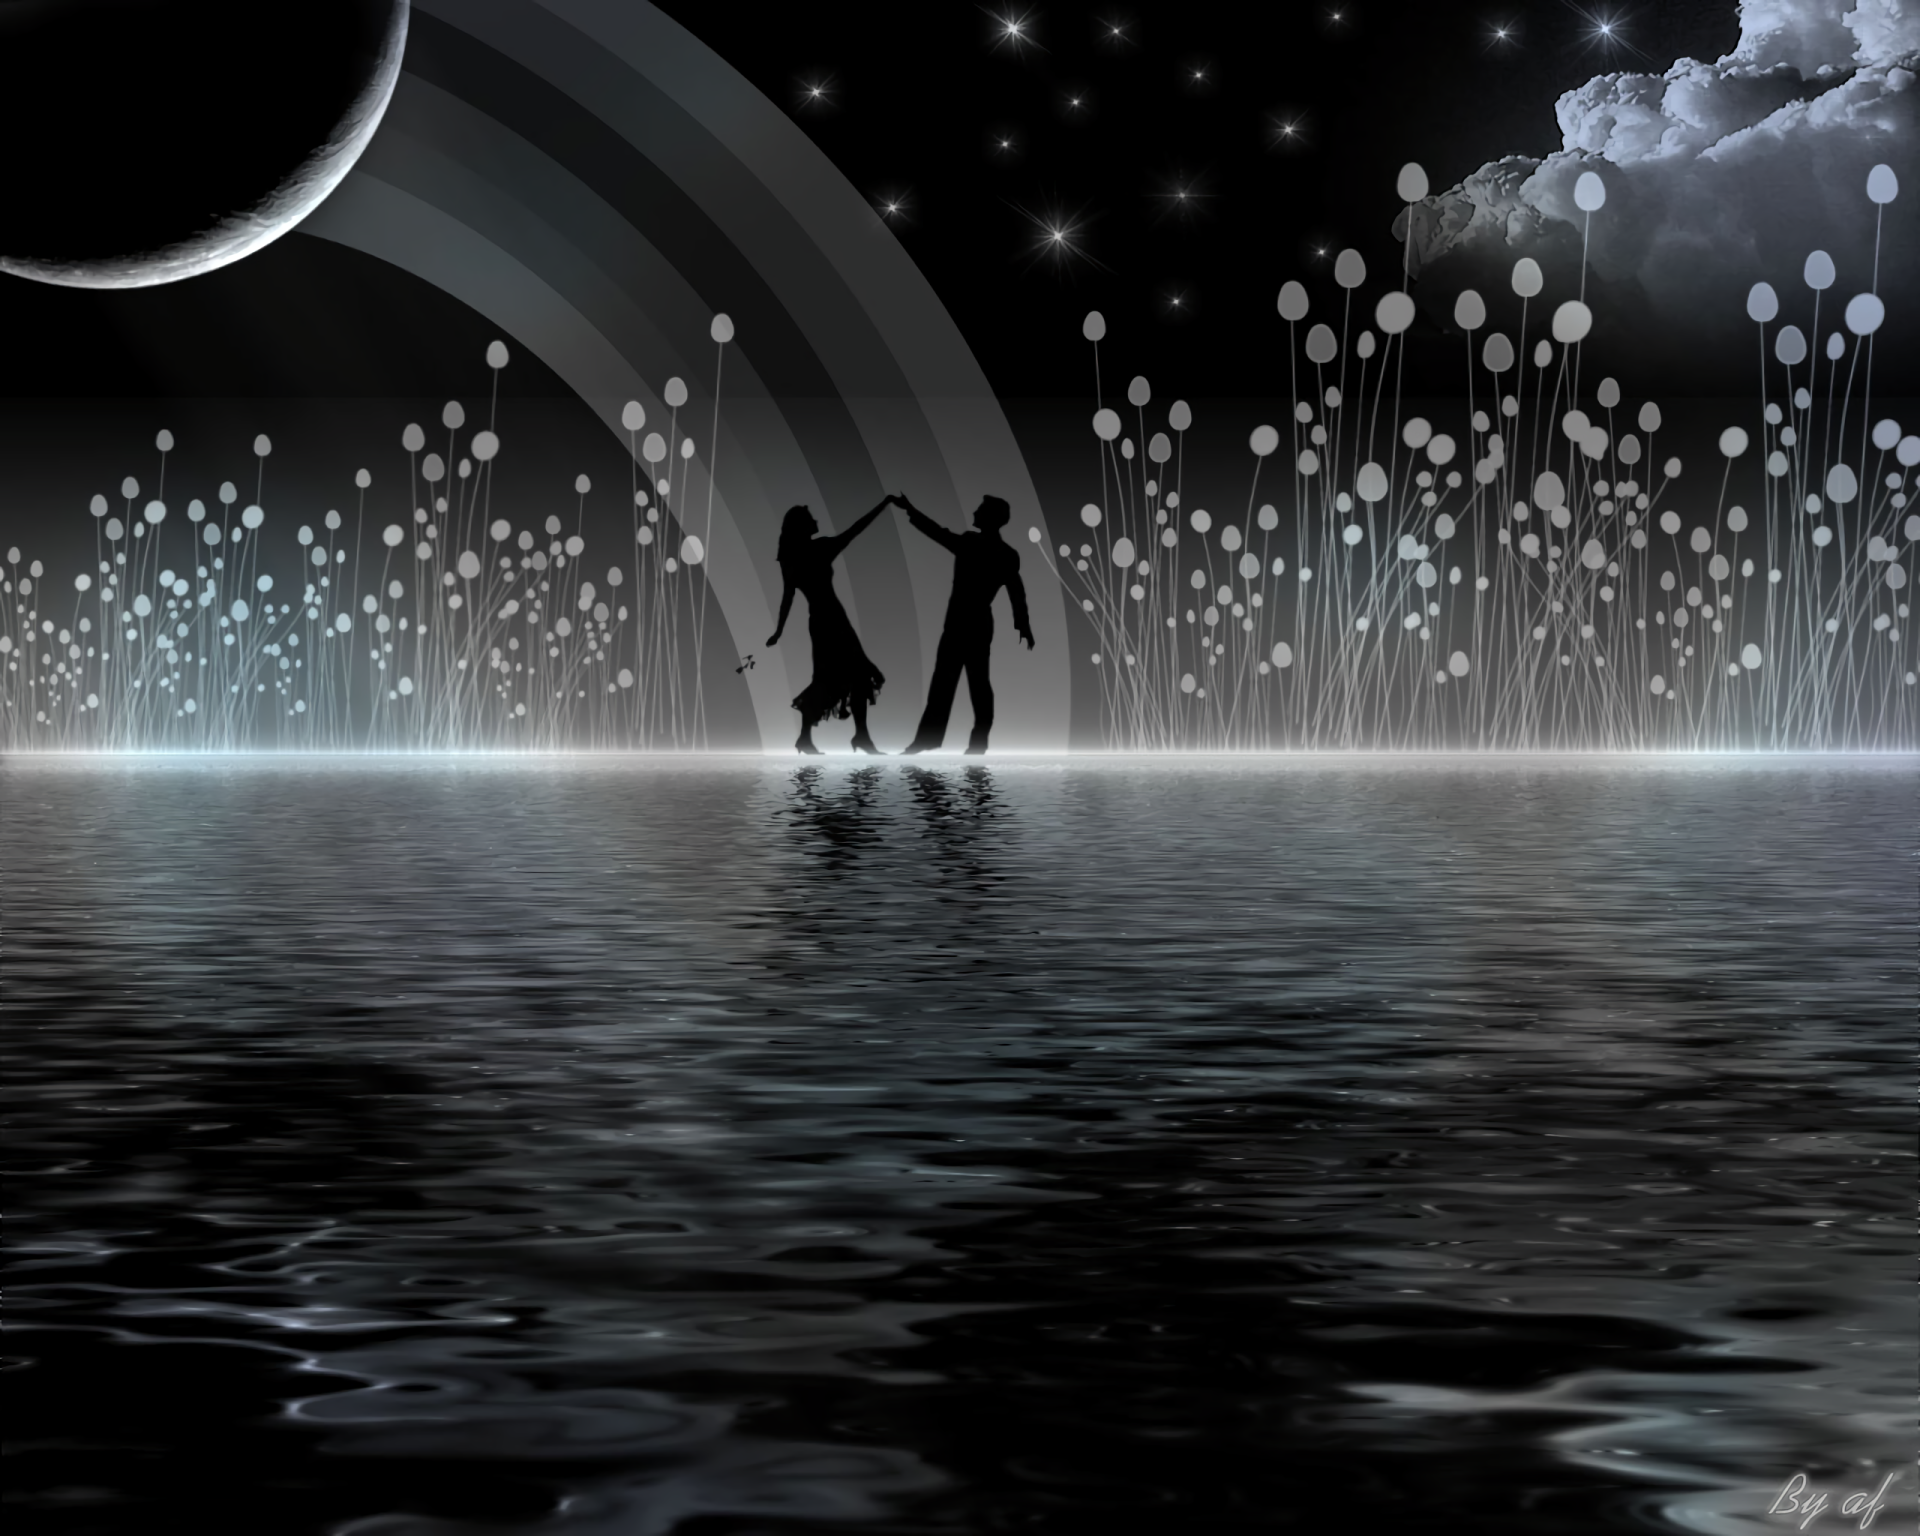 Artistic - Love  Artistic Man Woman Dancing Cloud Moon Night Wallpaper